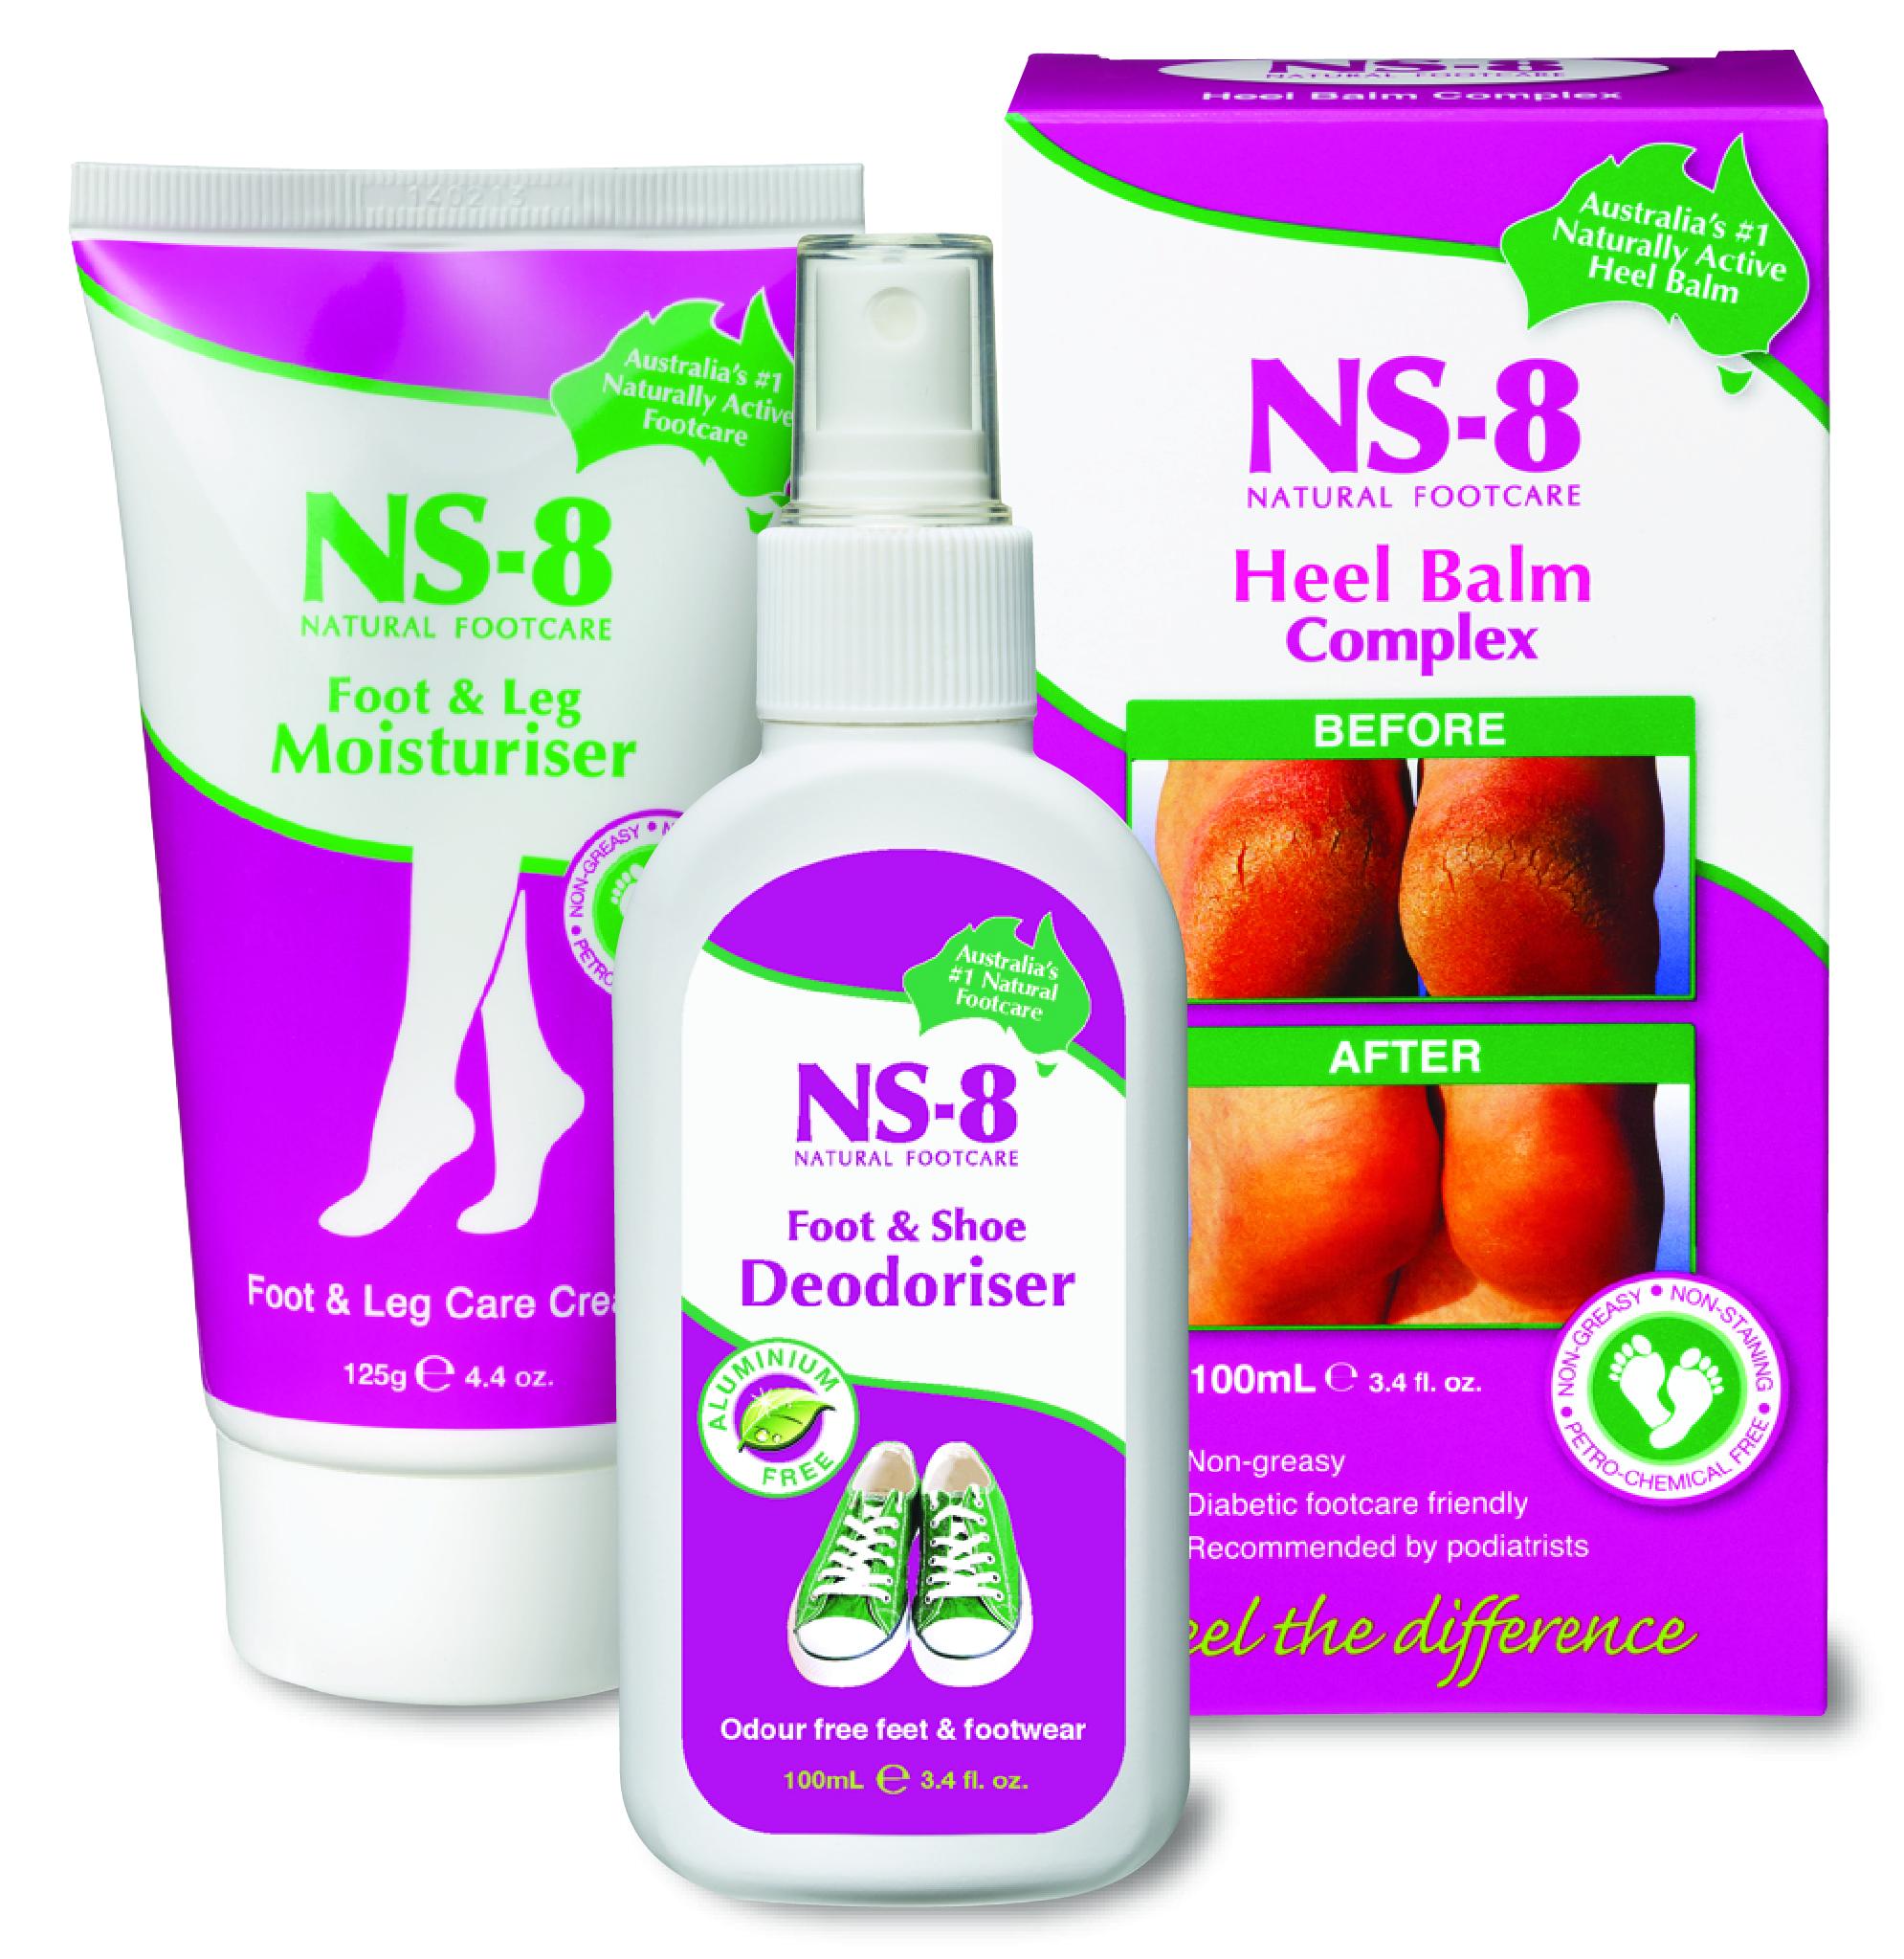 NS8 Image Sept15